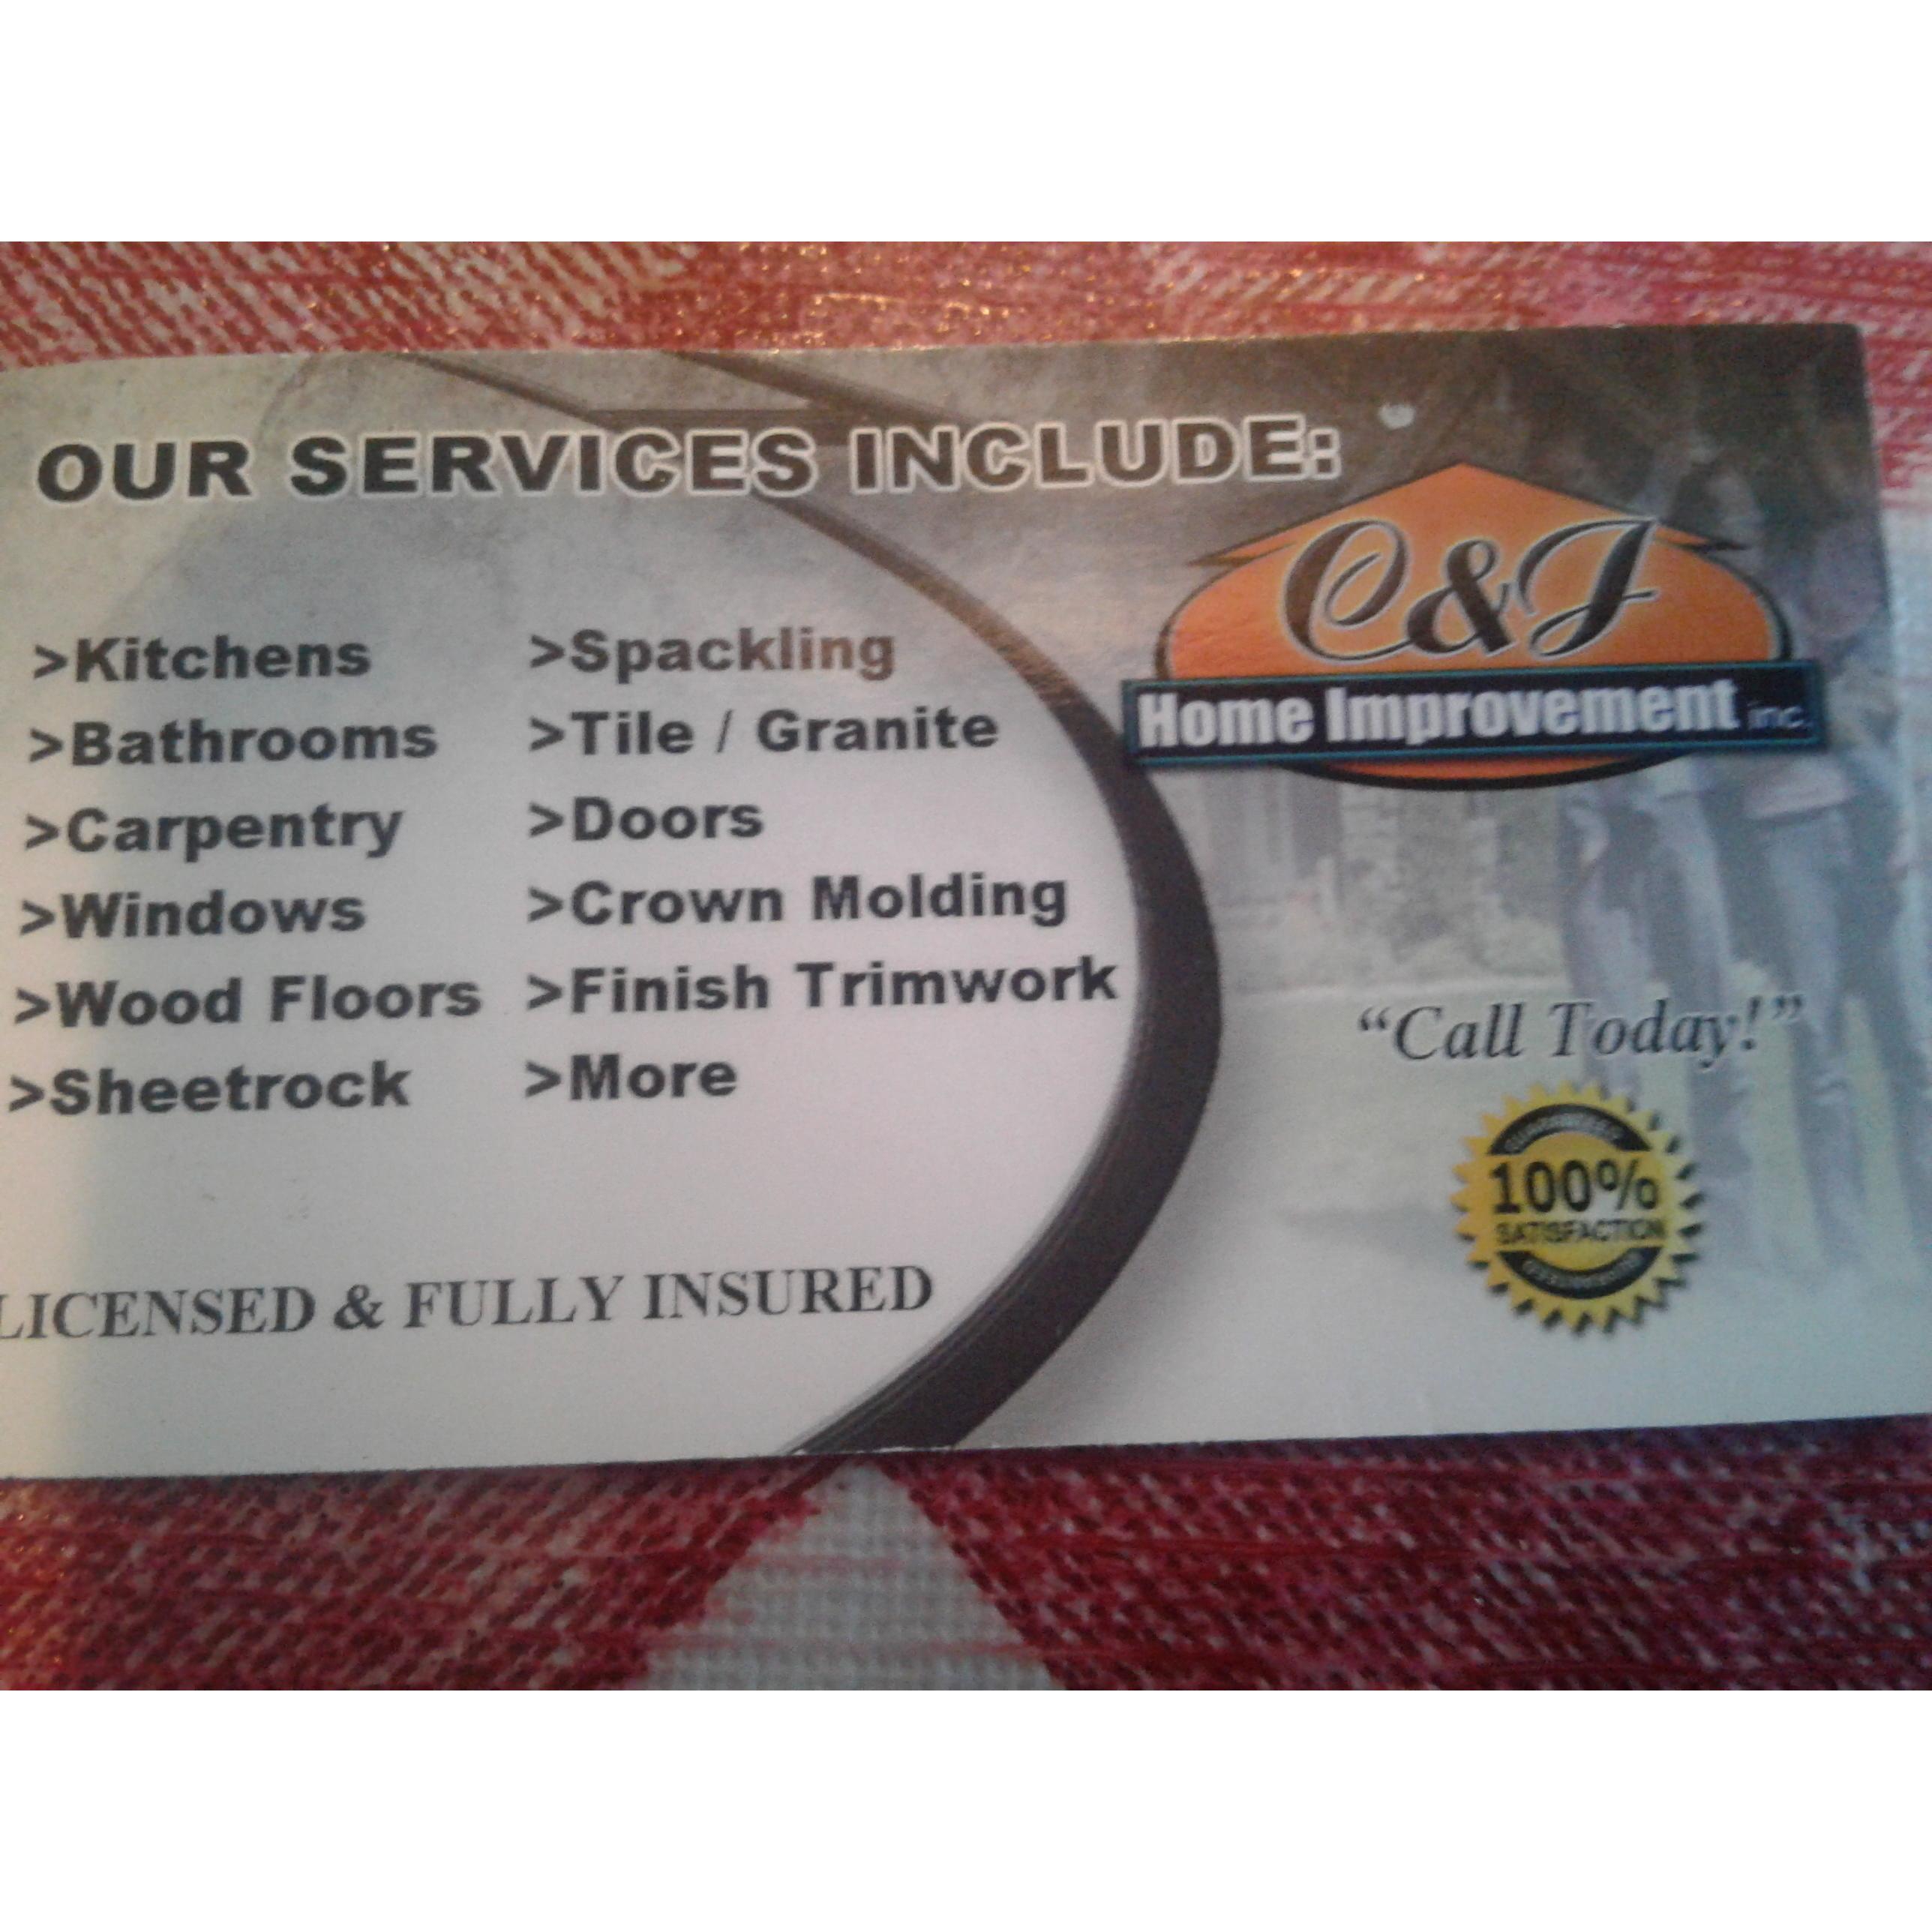 C and J Home Improvement Inc